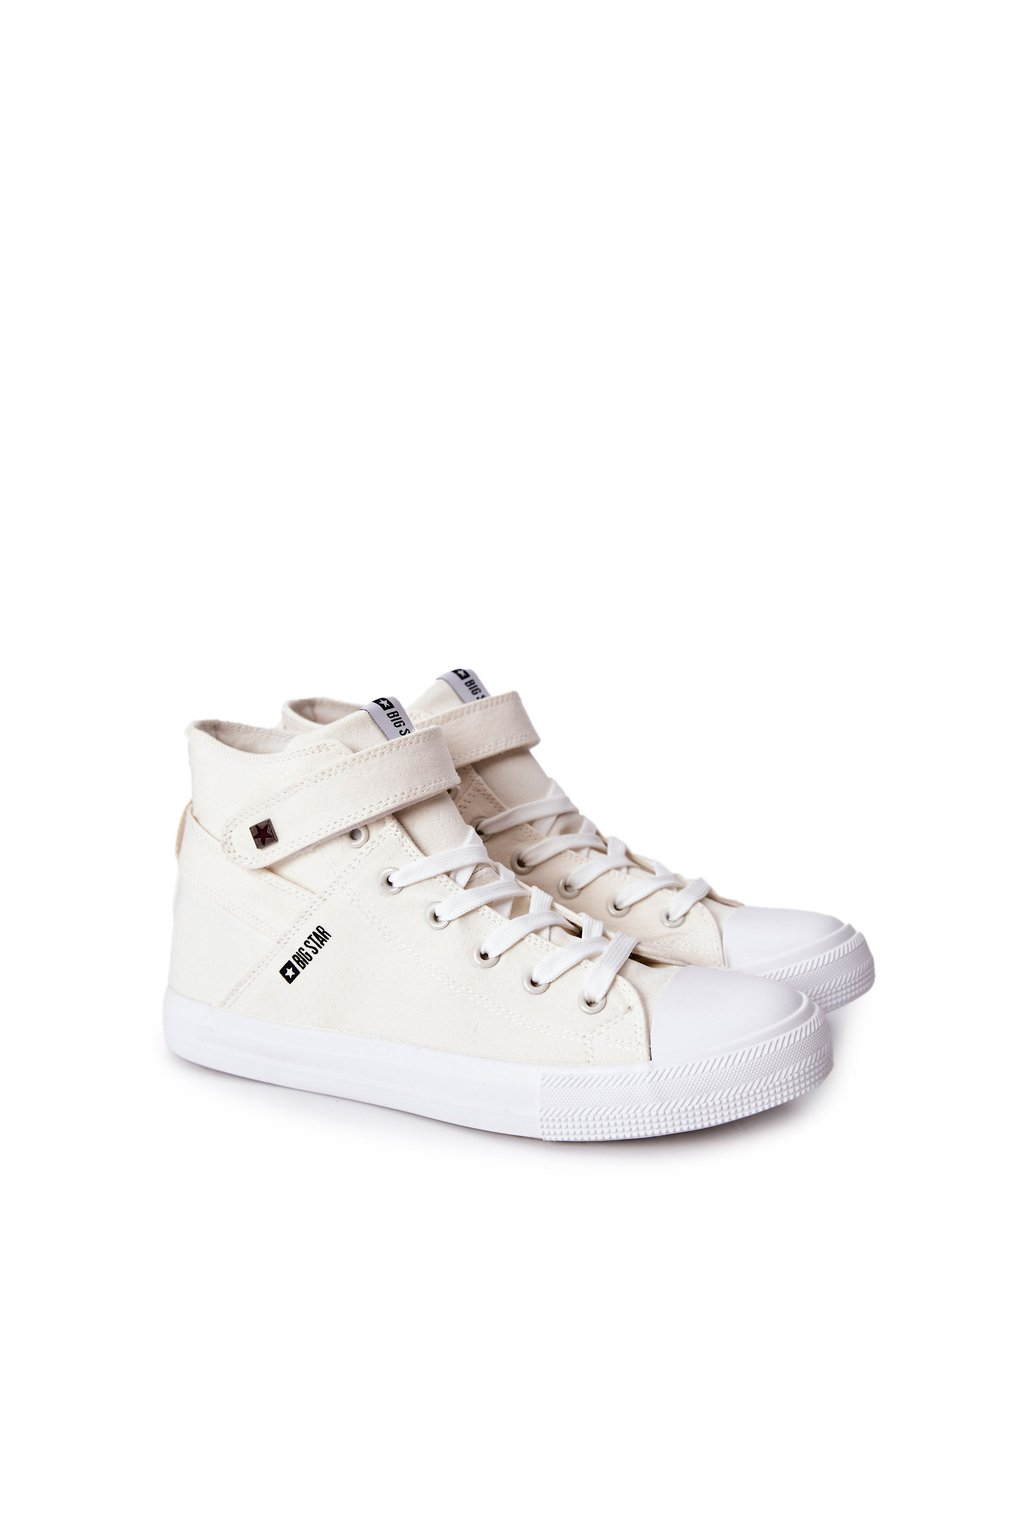 Biela obuv kód topánok FF174140 WHT